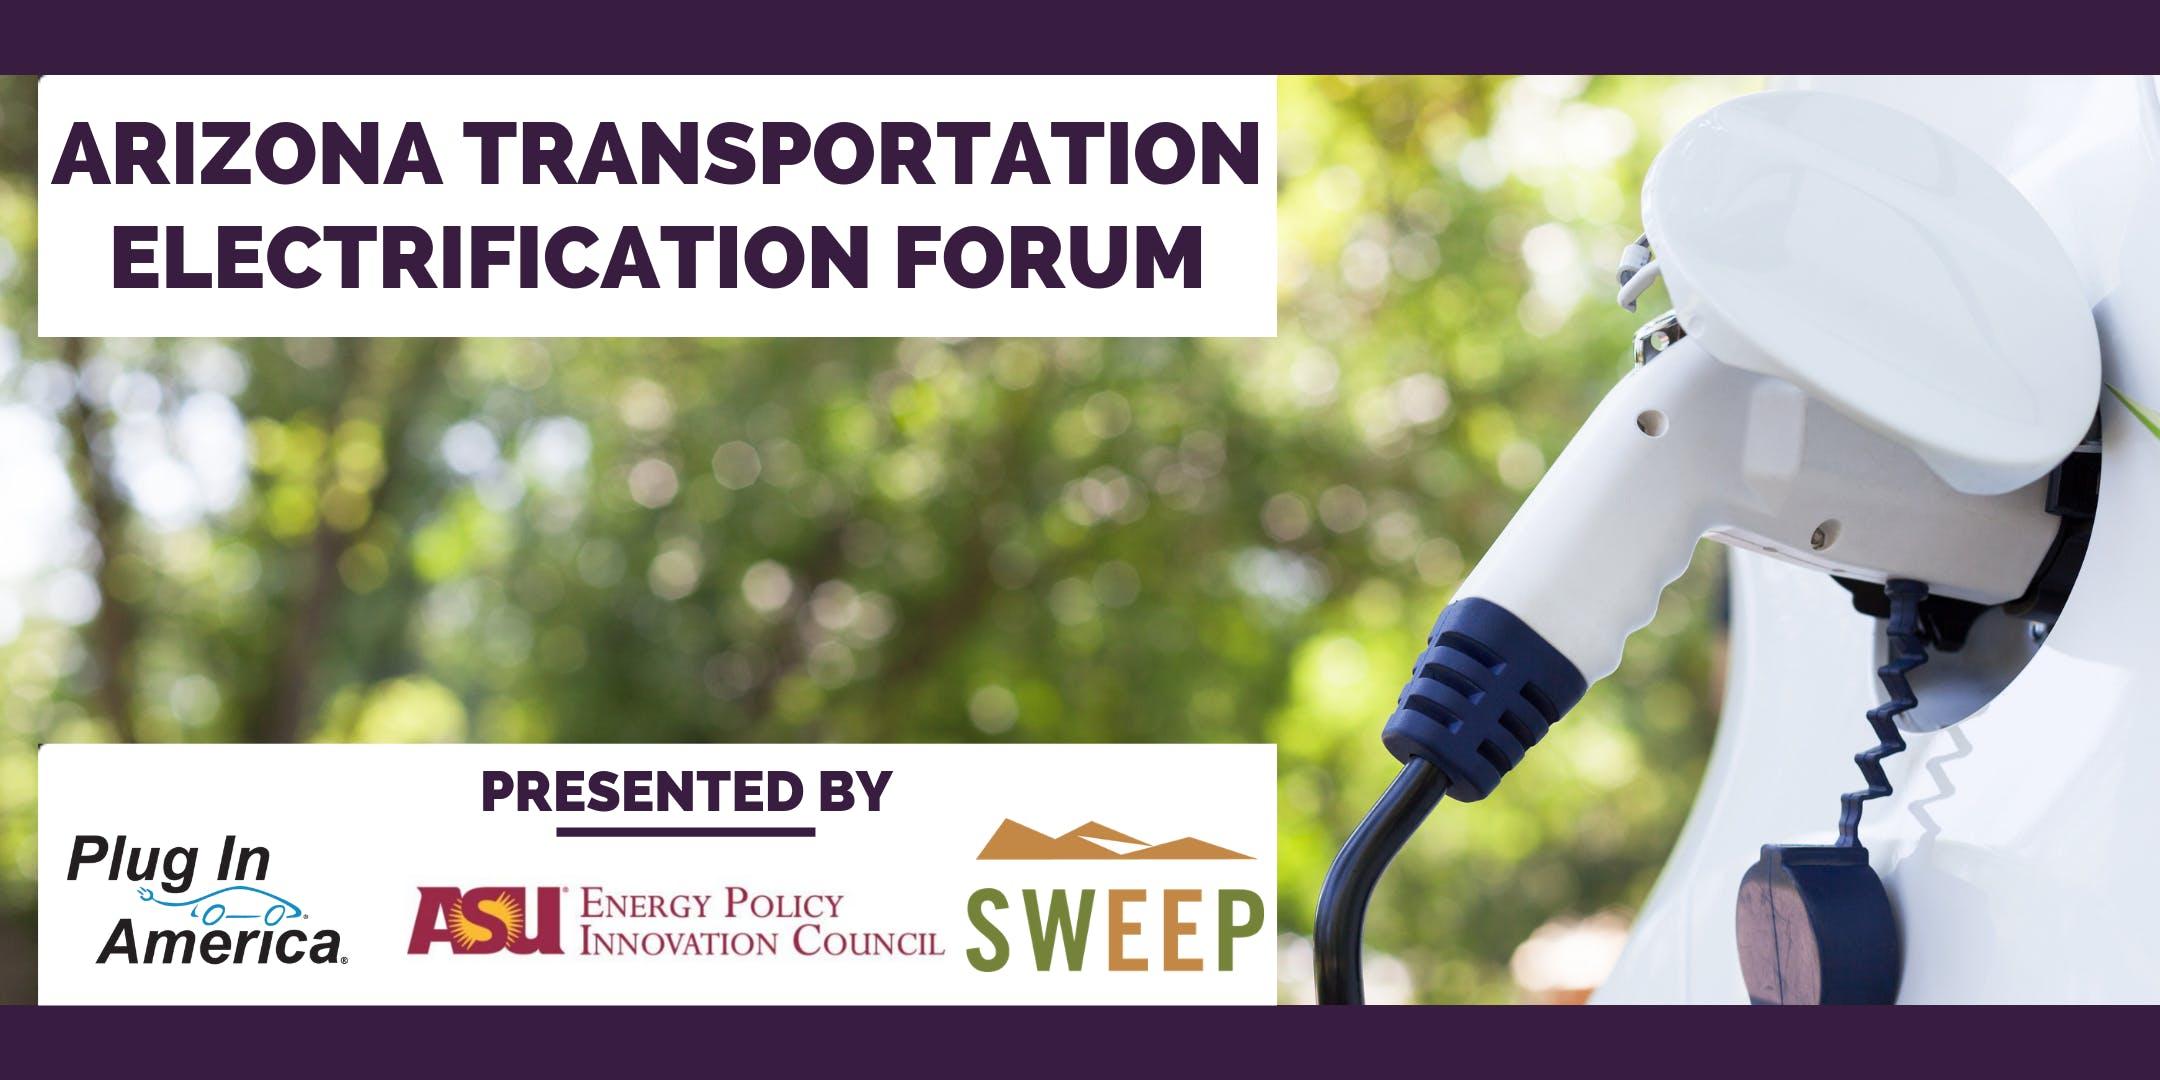 Arizona Transportation Electrification Forum